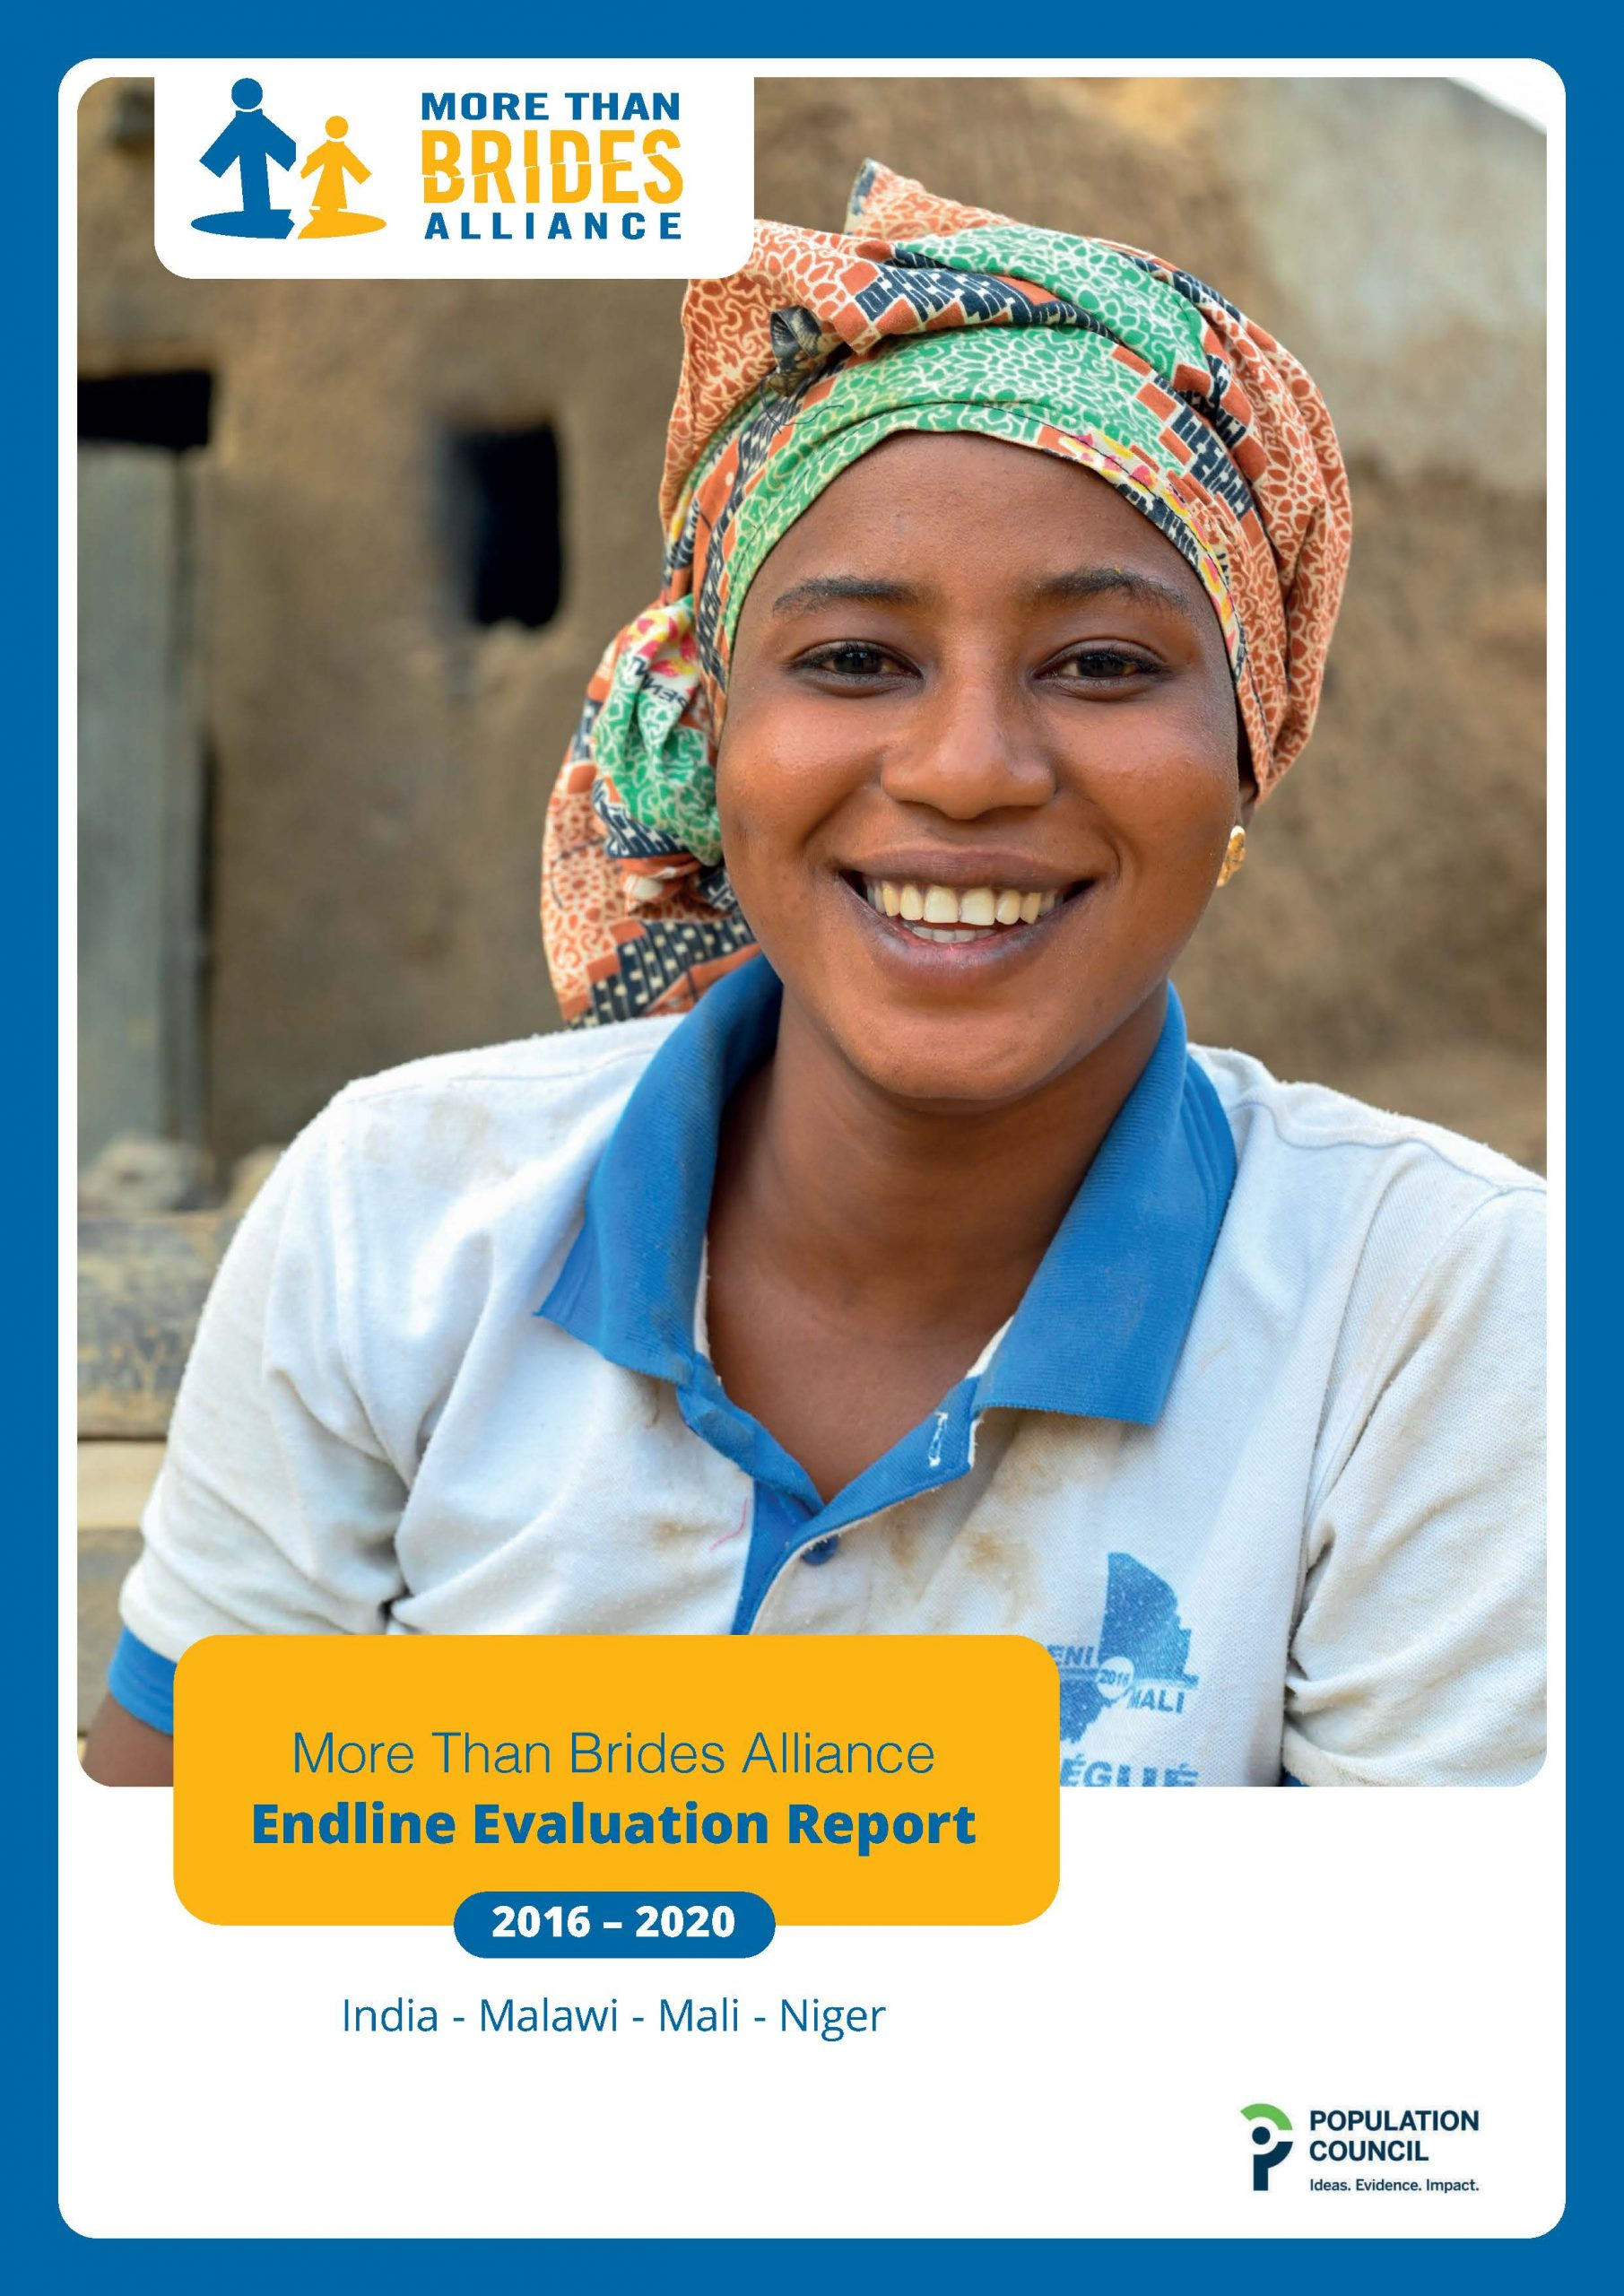 Endline Evaluation Report 2016-2020